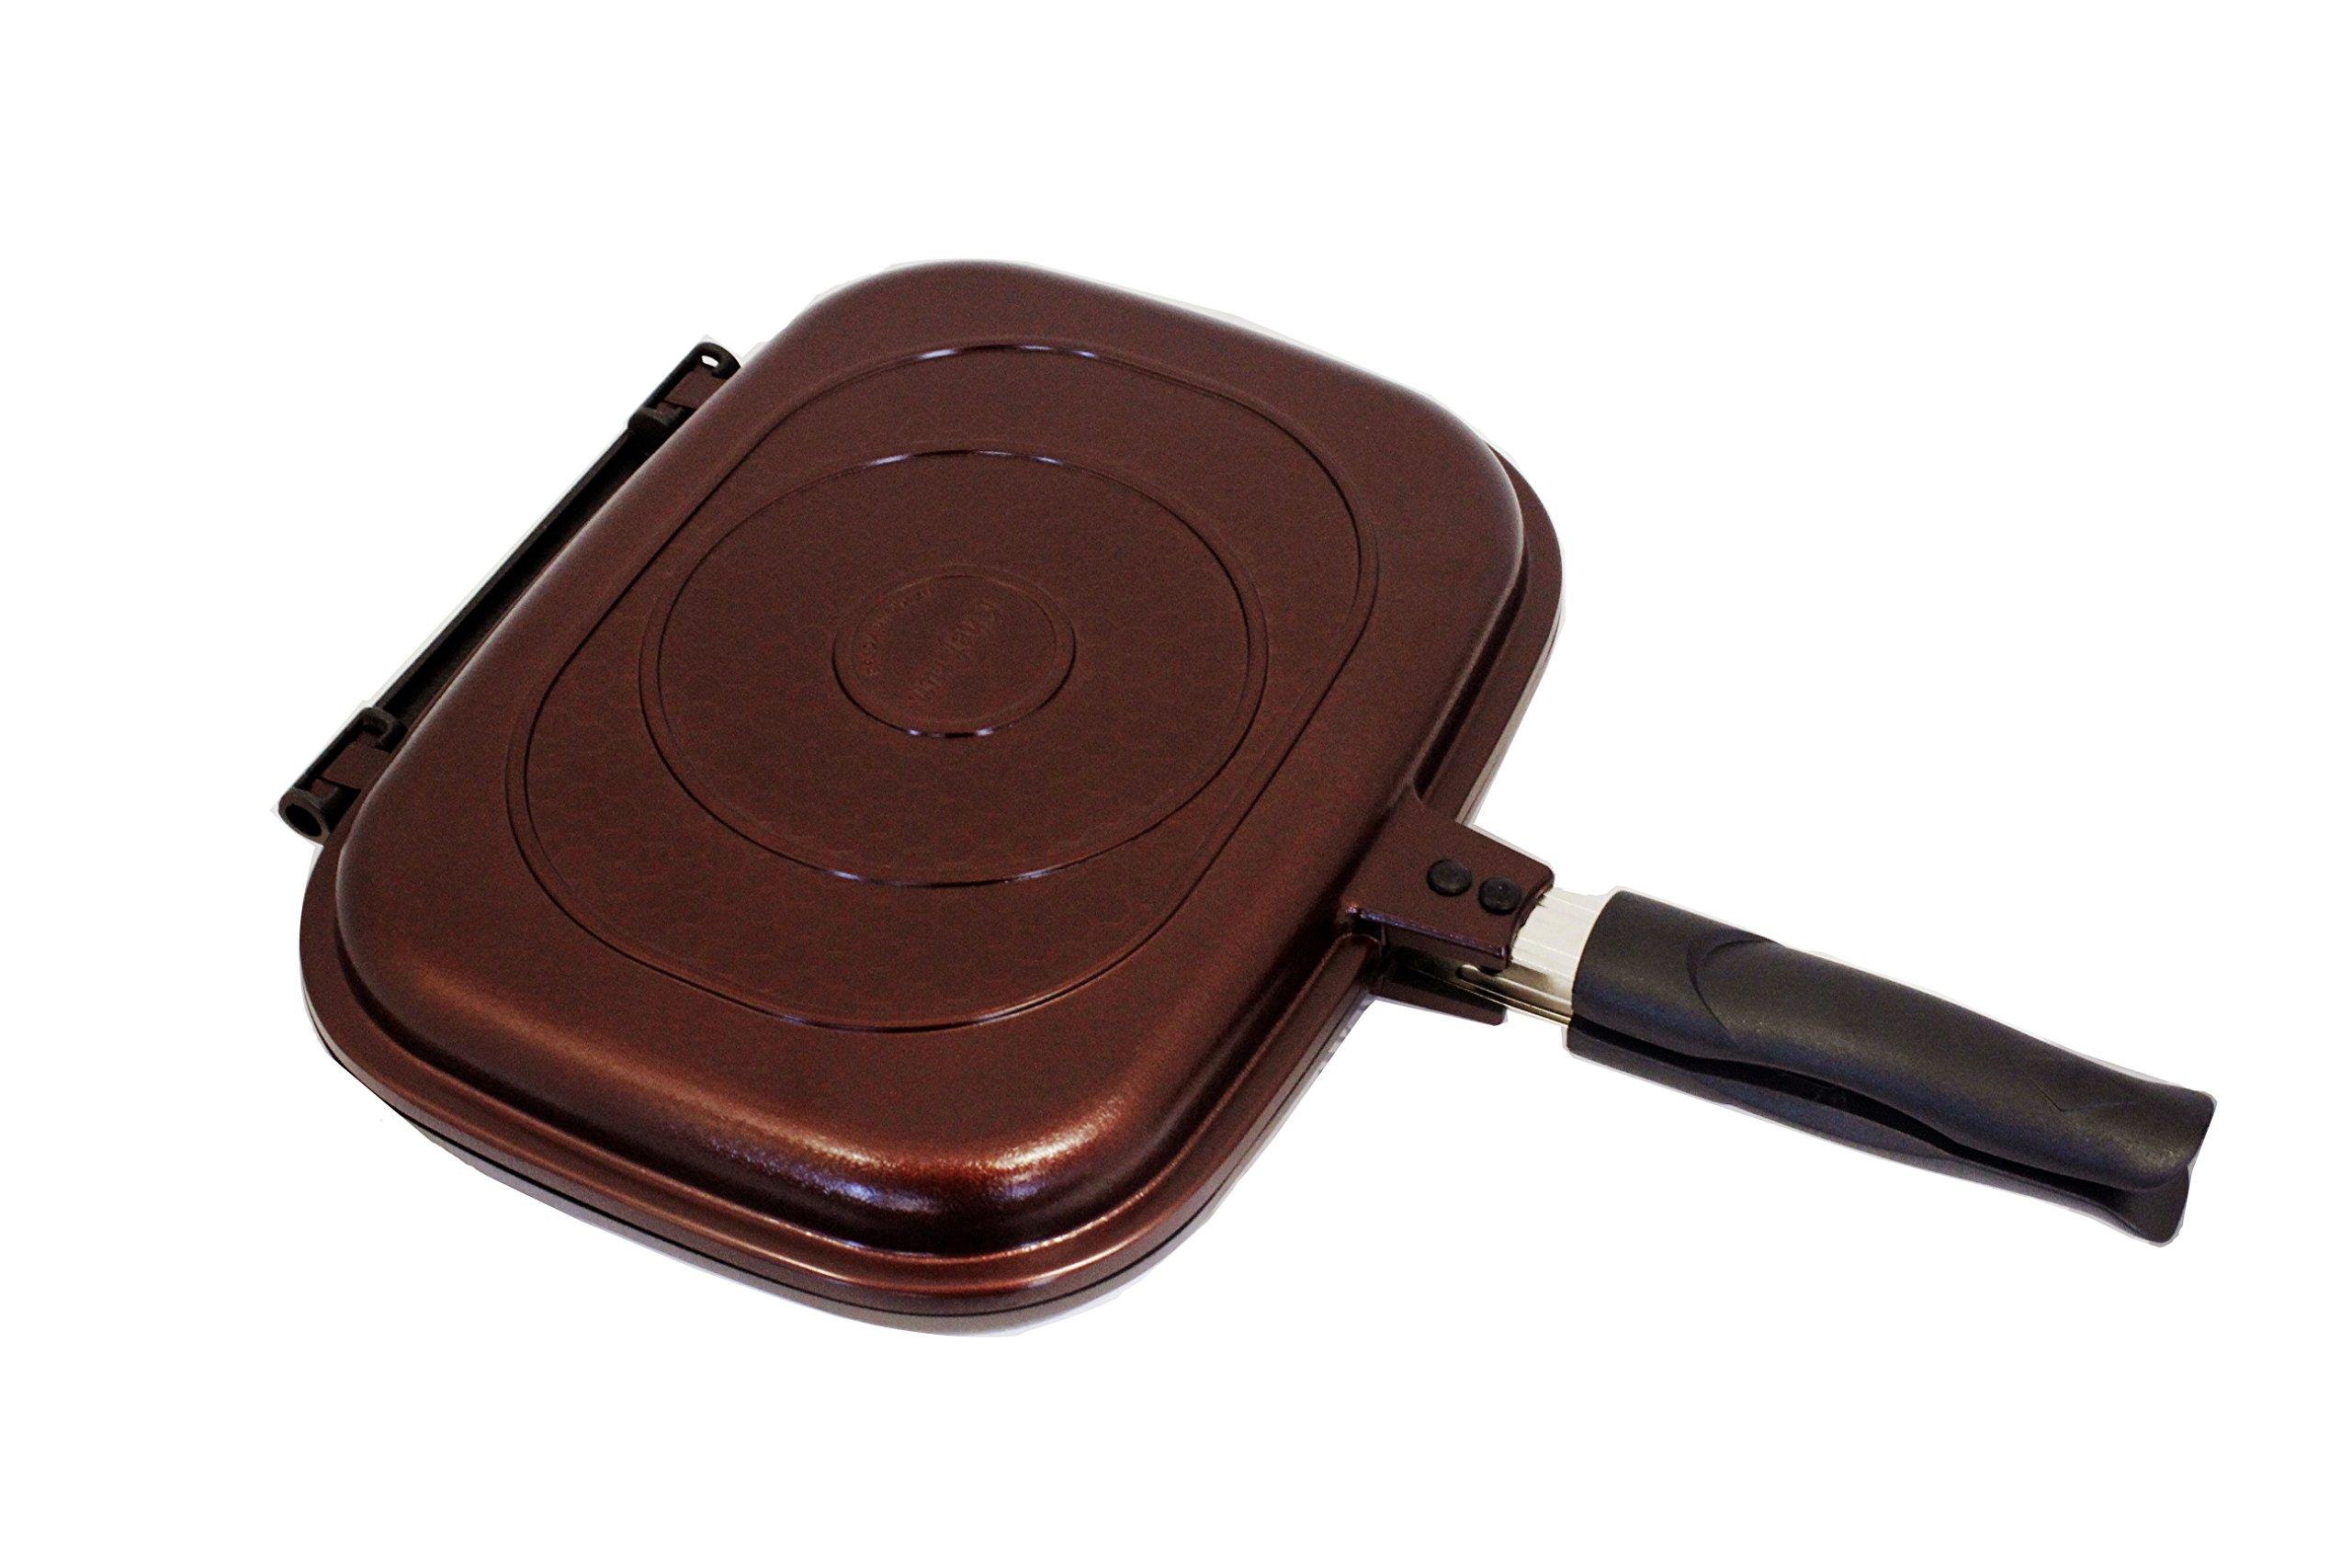 Chefrun Double Two sided Pan- Non stick, Smoke free grill pan